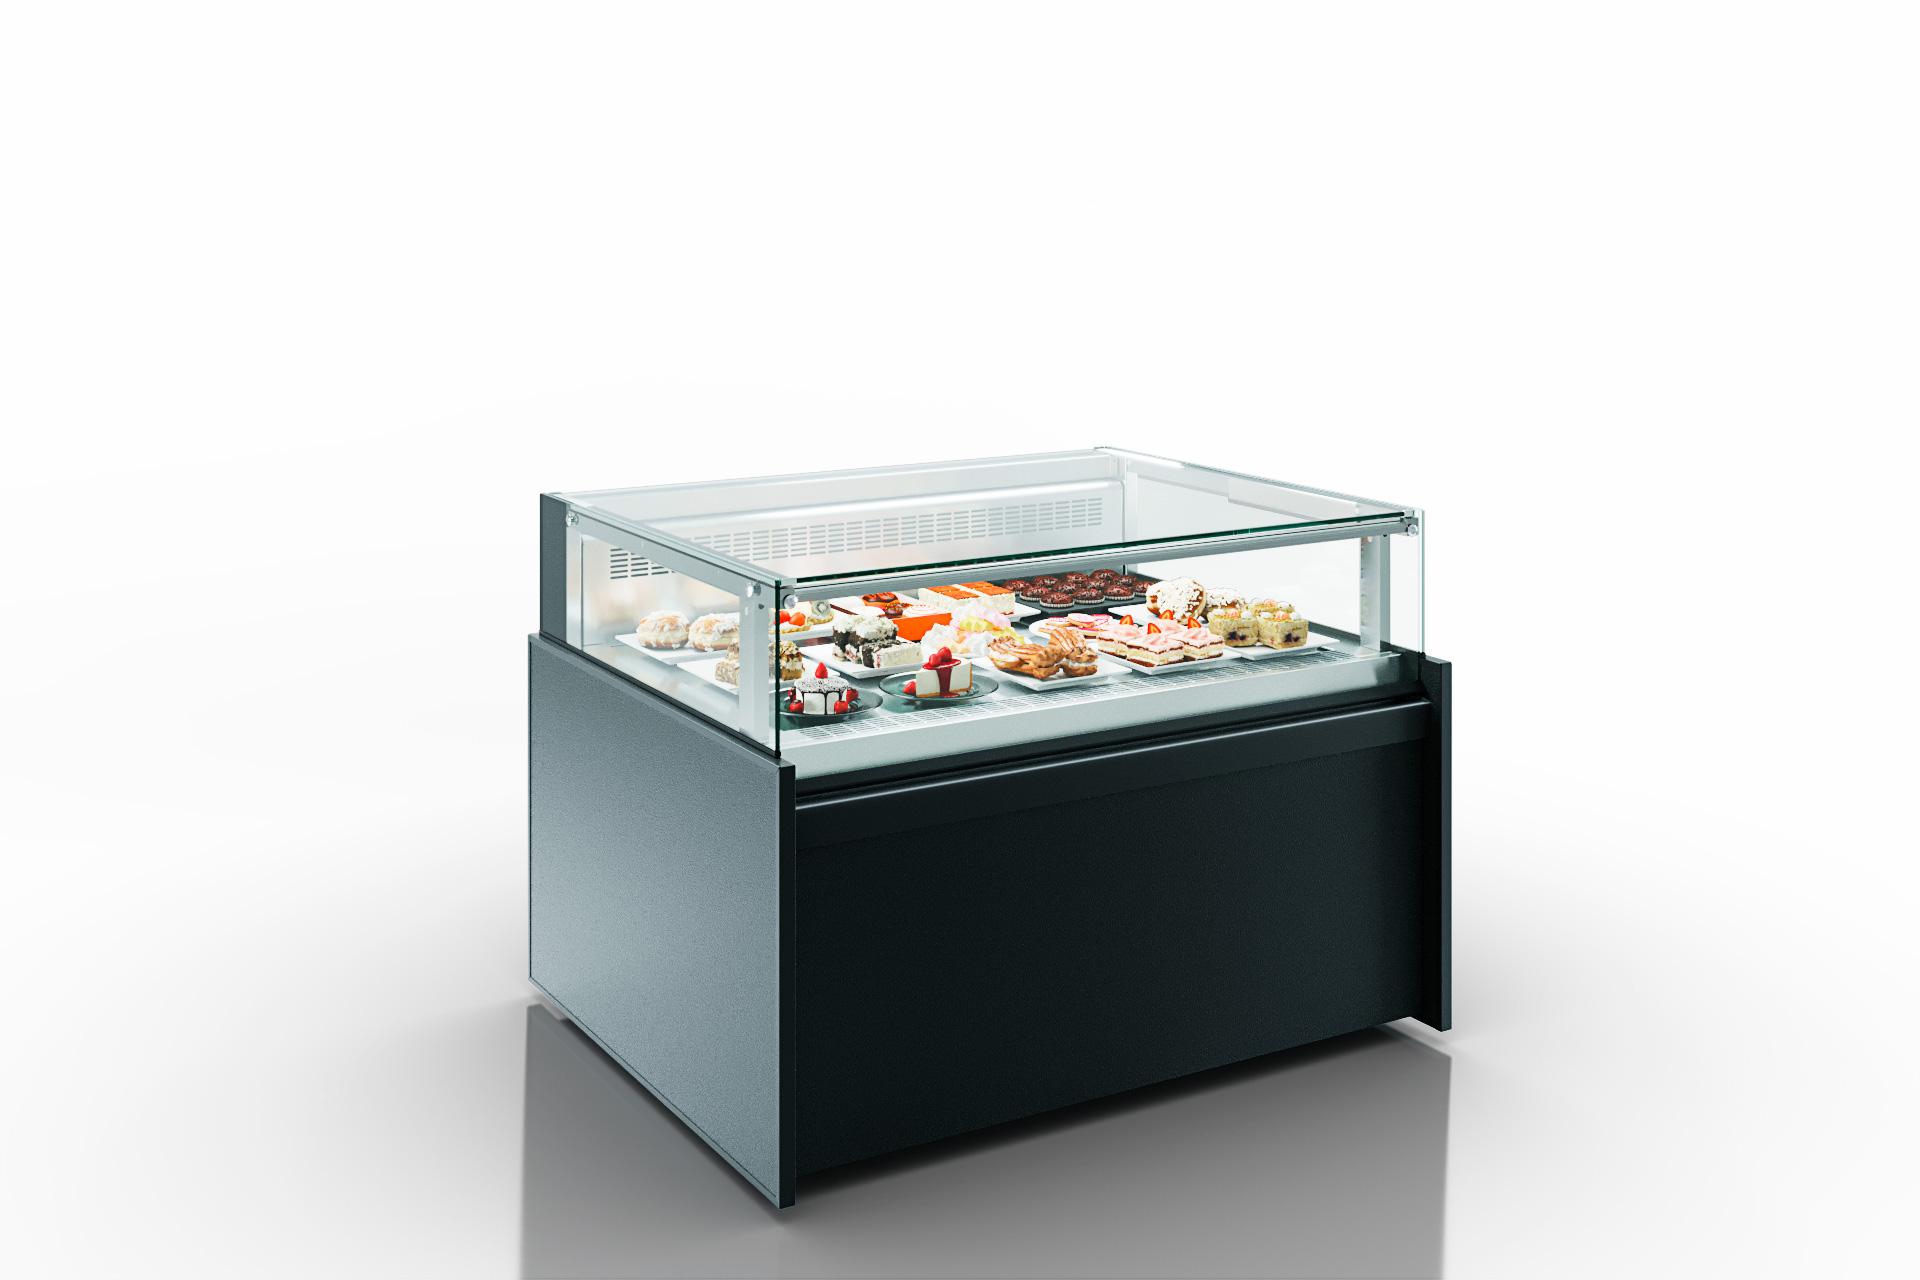 Refrigerated counters Missouri MC 100 patisserie СН SP 092-DLA